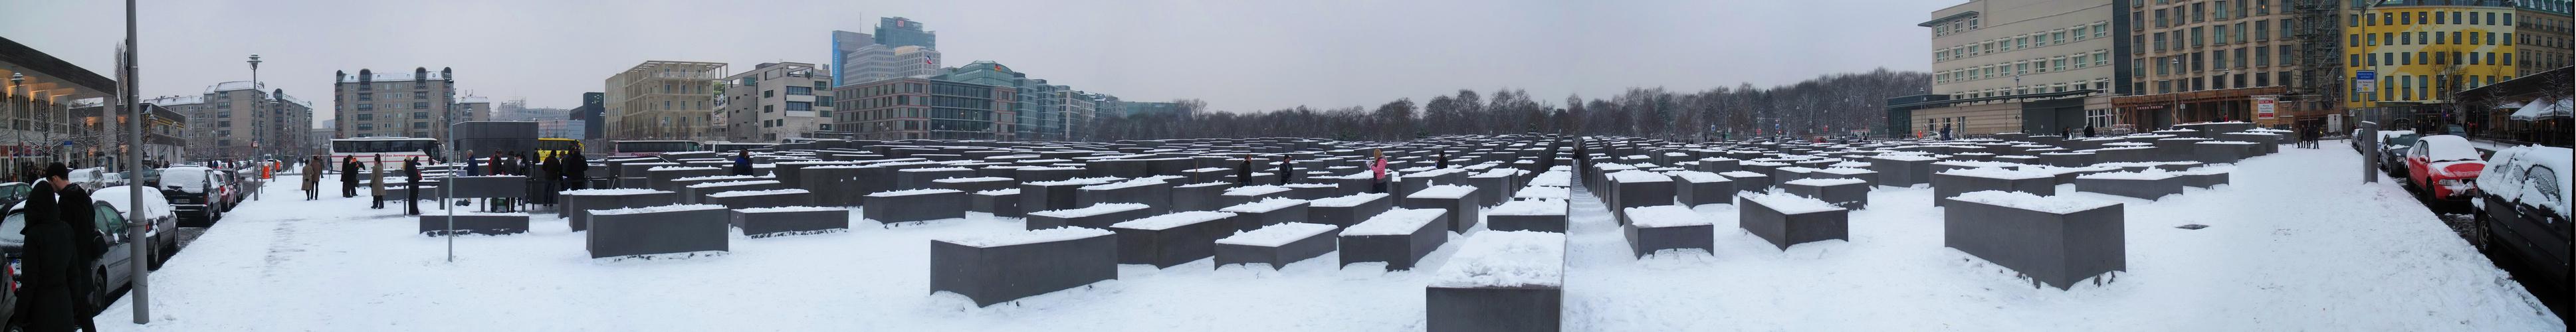 Holocaust-Mahnmal im Schnee